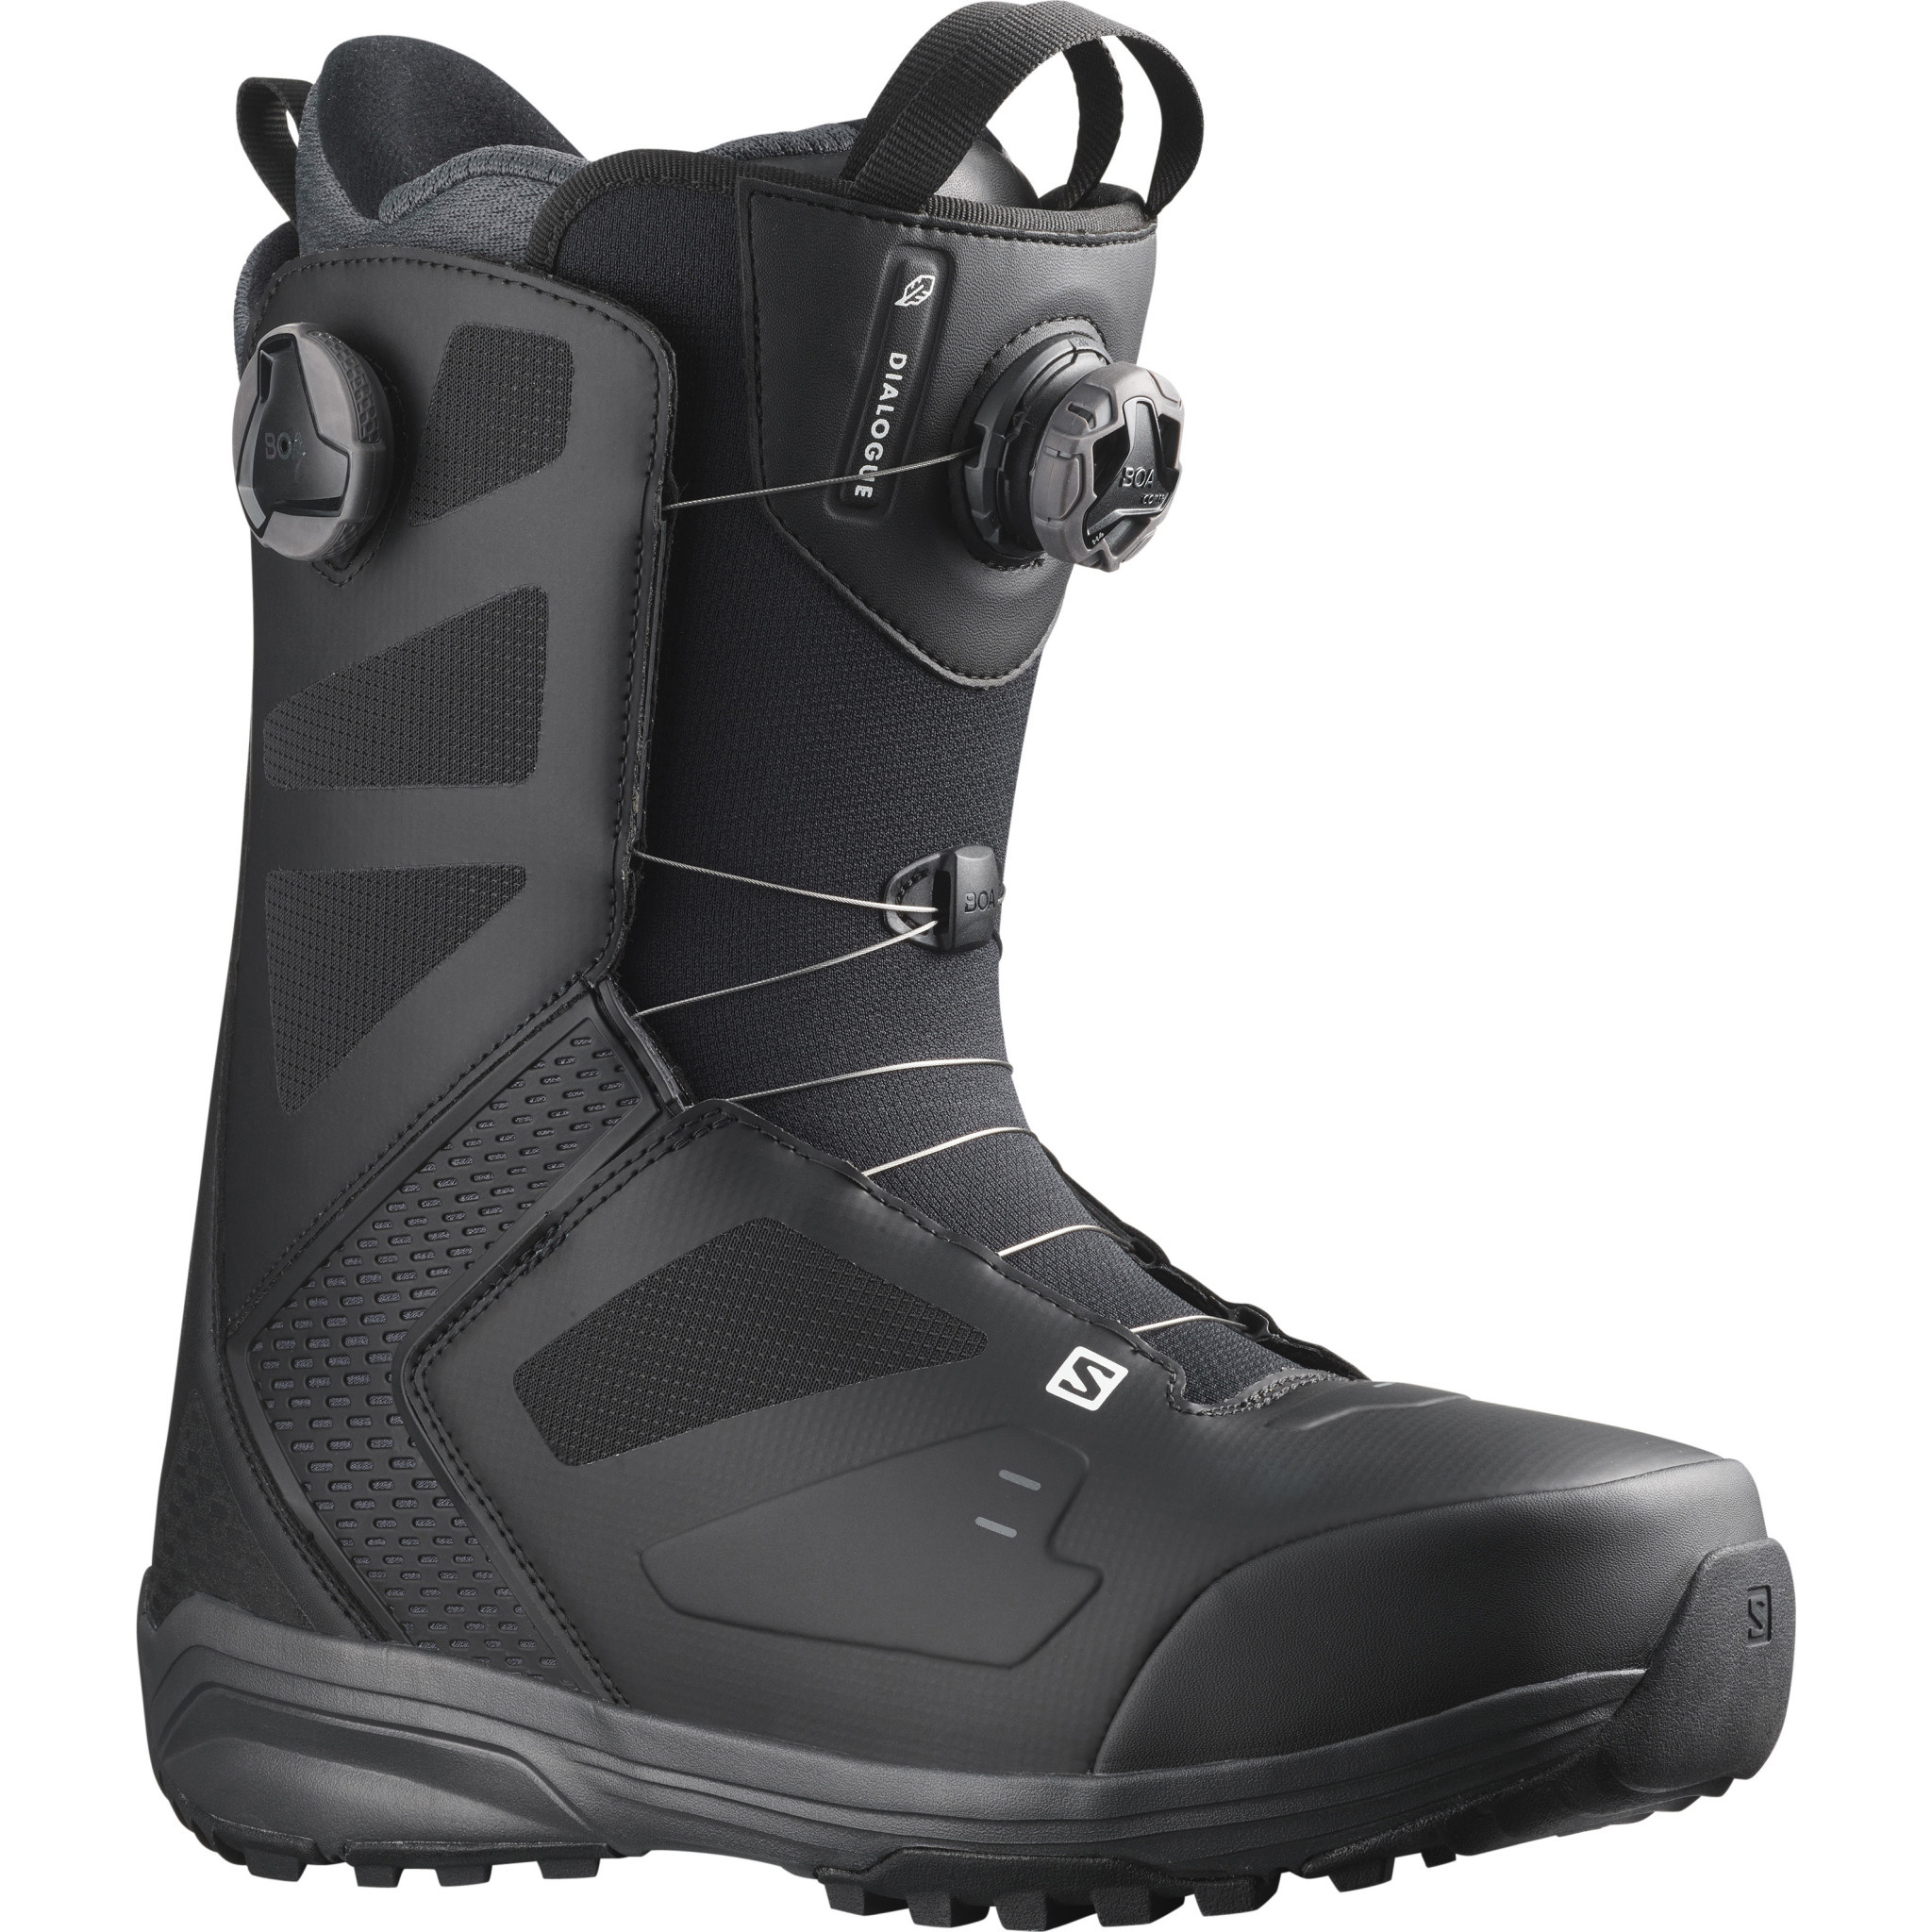 Salomon Snowboard Salomon M's Dialogue Dual BOA Snowboard Boot (2022)